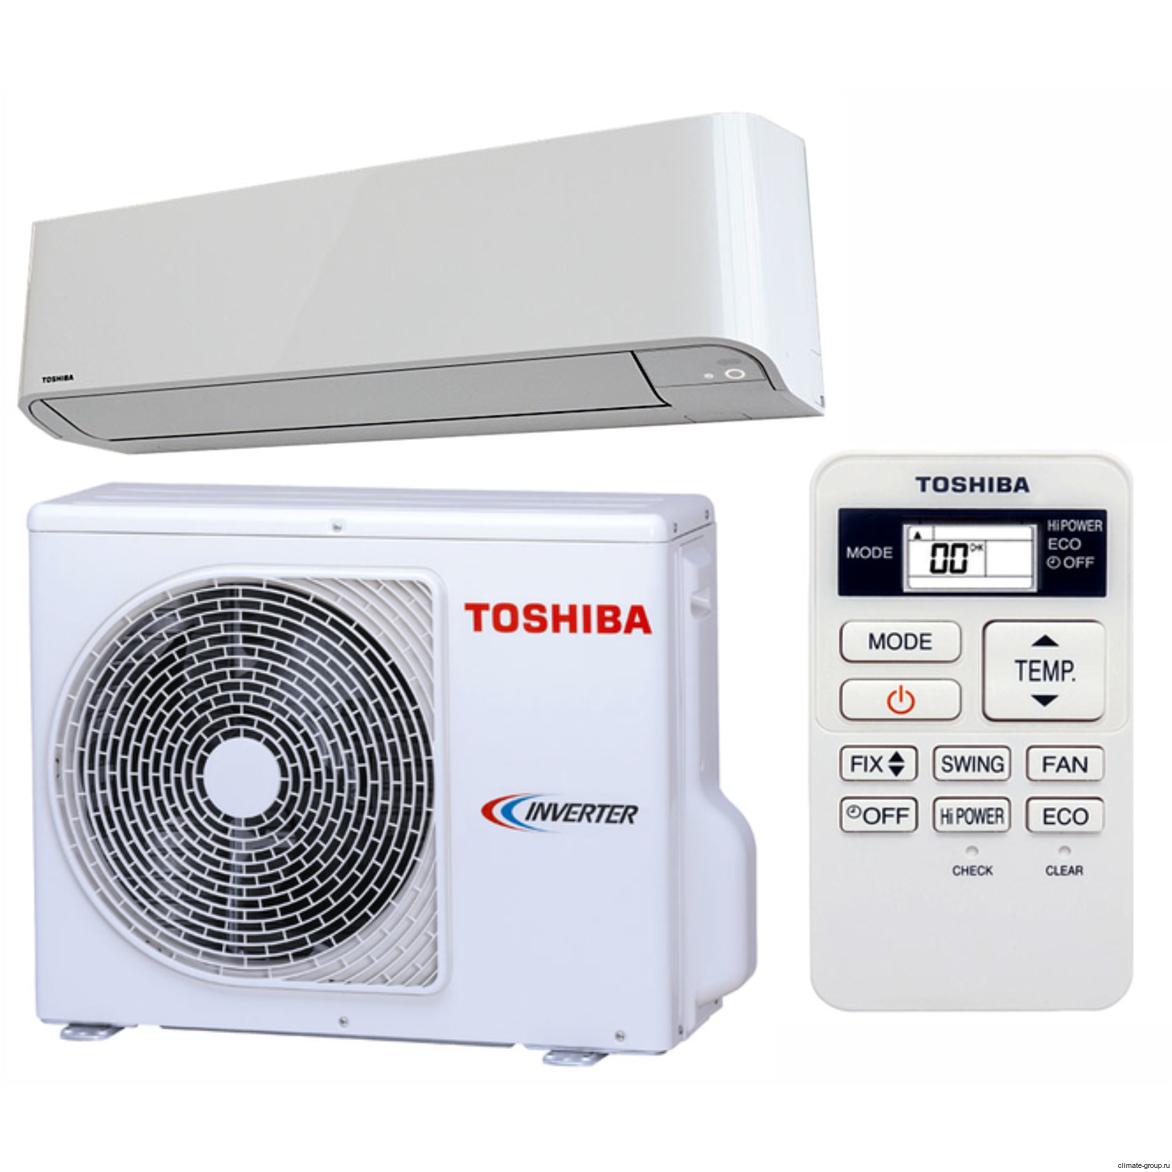 Кондиционер Toshiba RAS-05BKVG-EE / RAS-05BAVG-EE